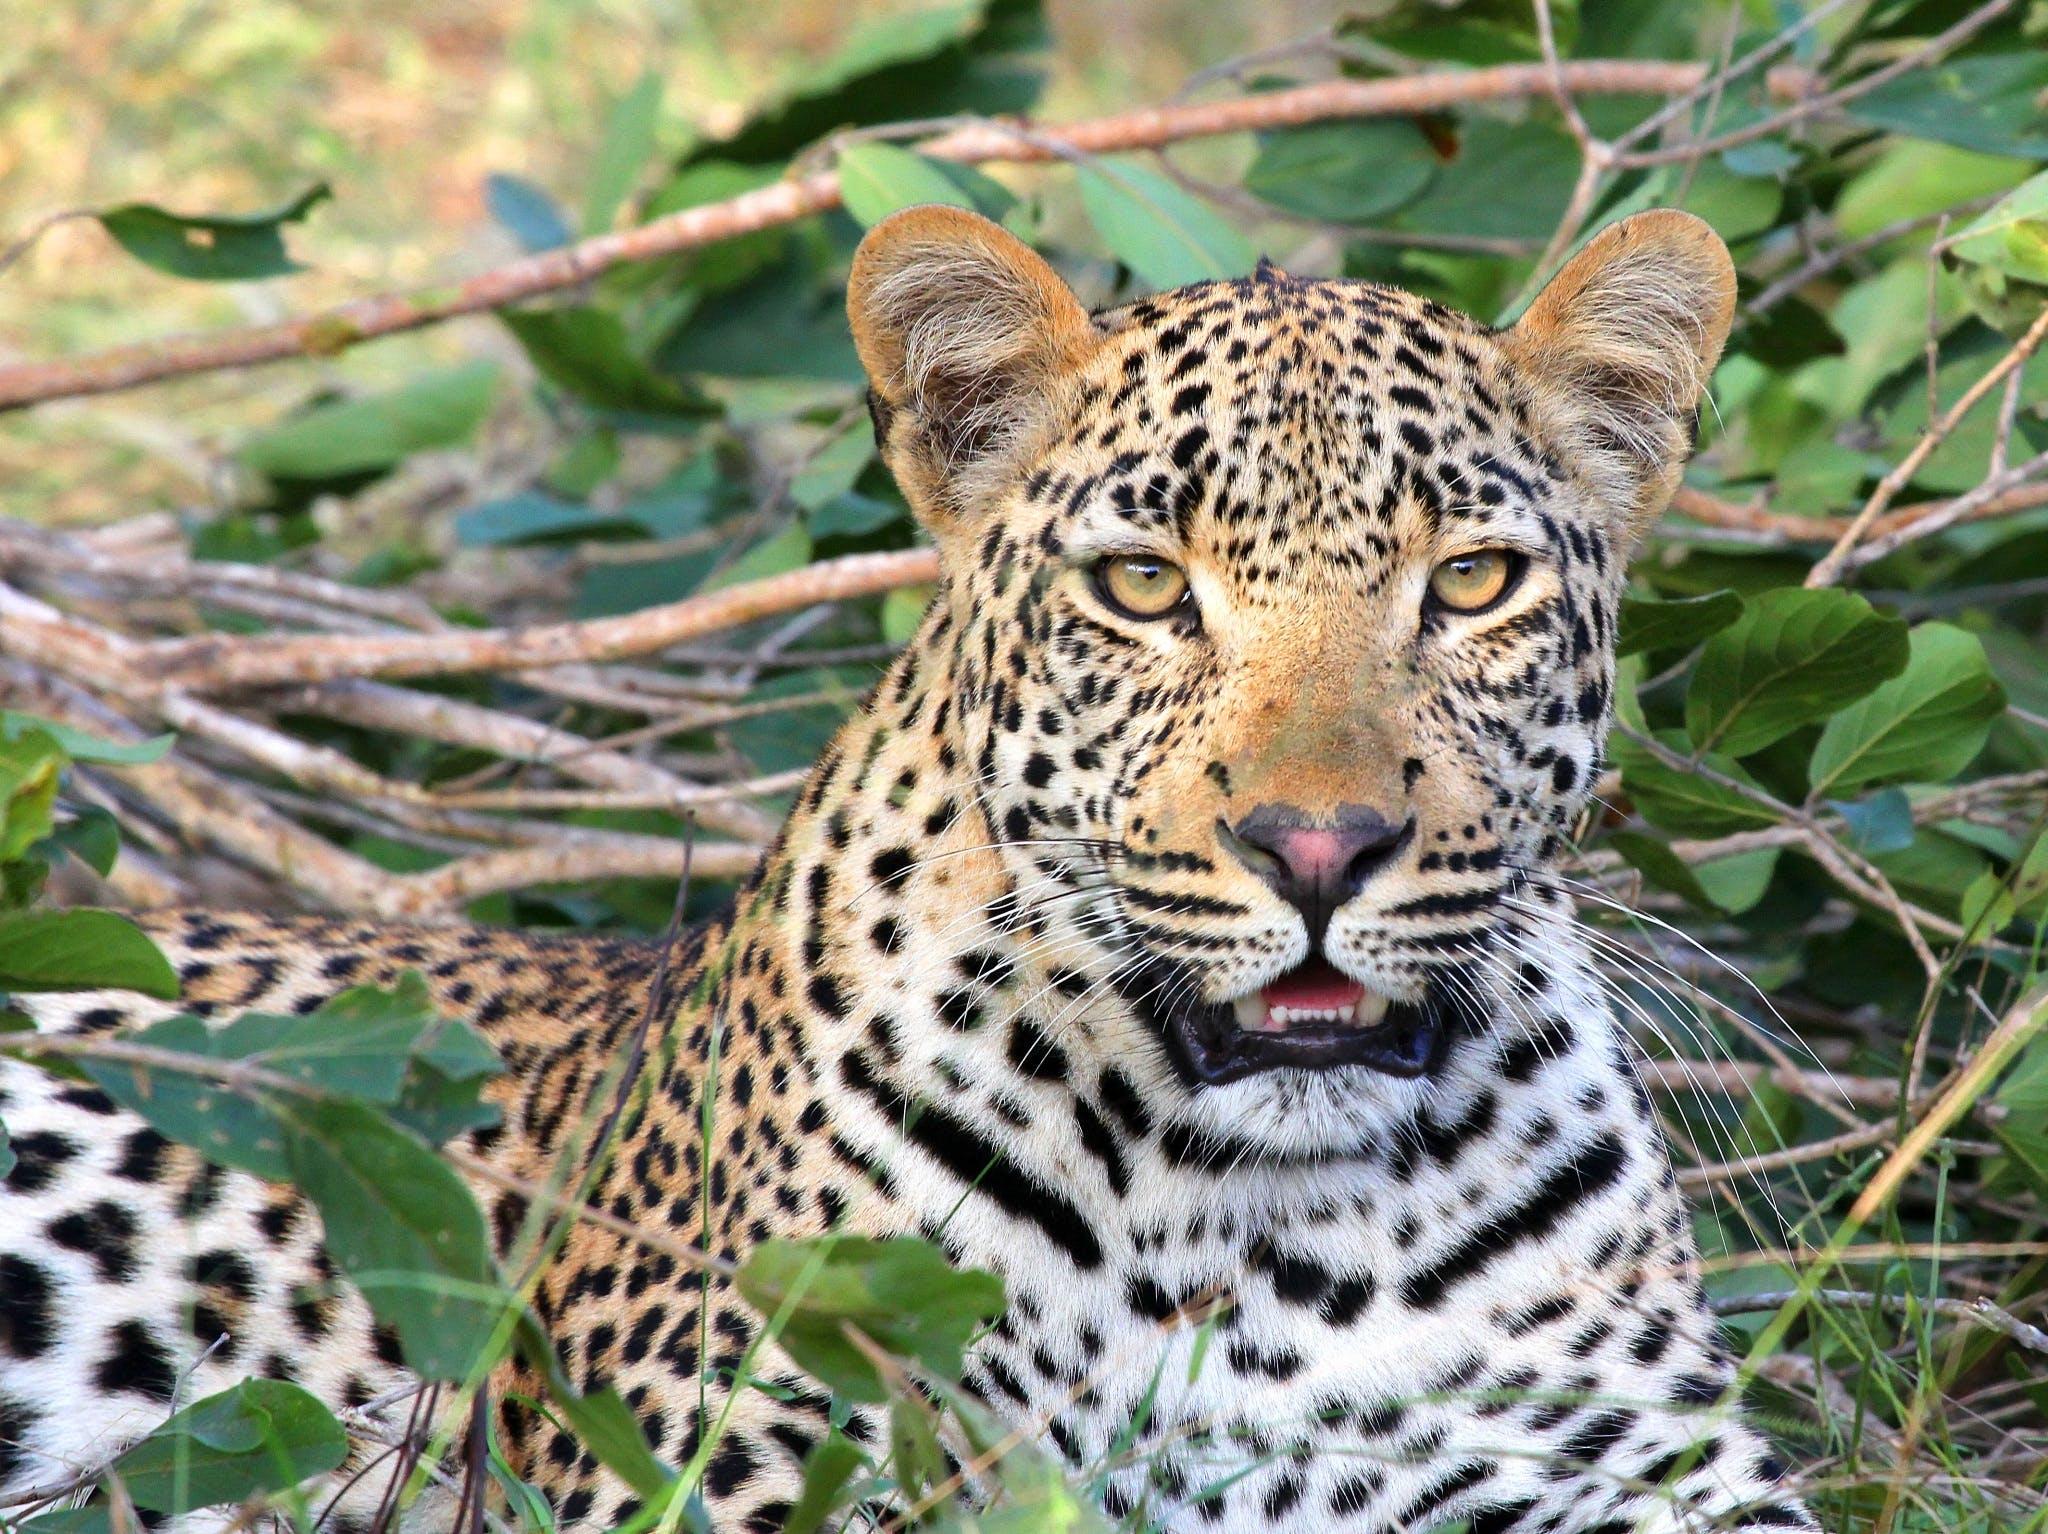 Leopard Sitting on Green Grass